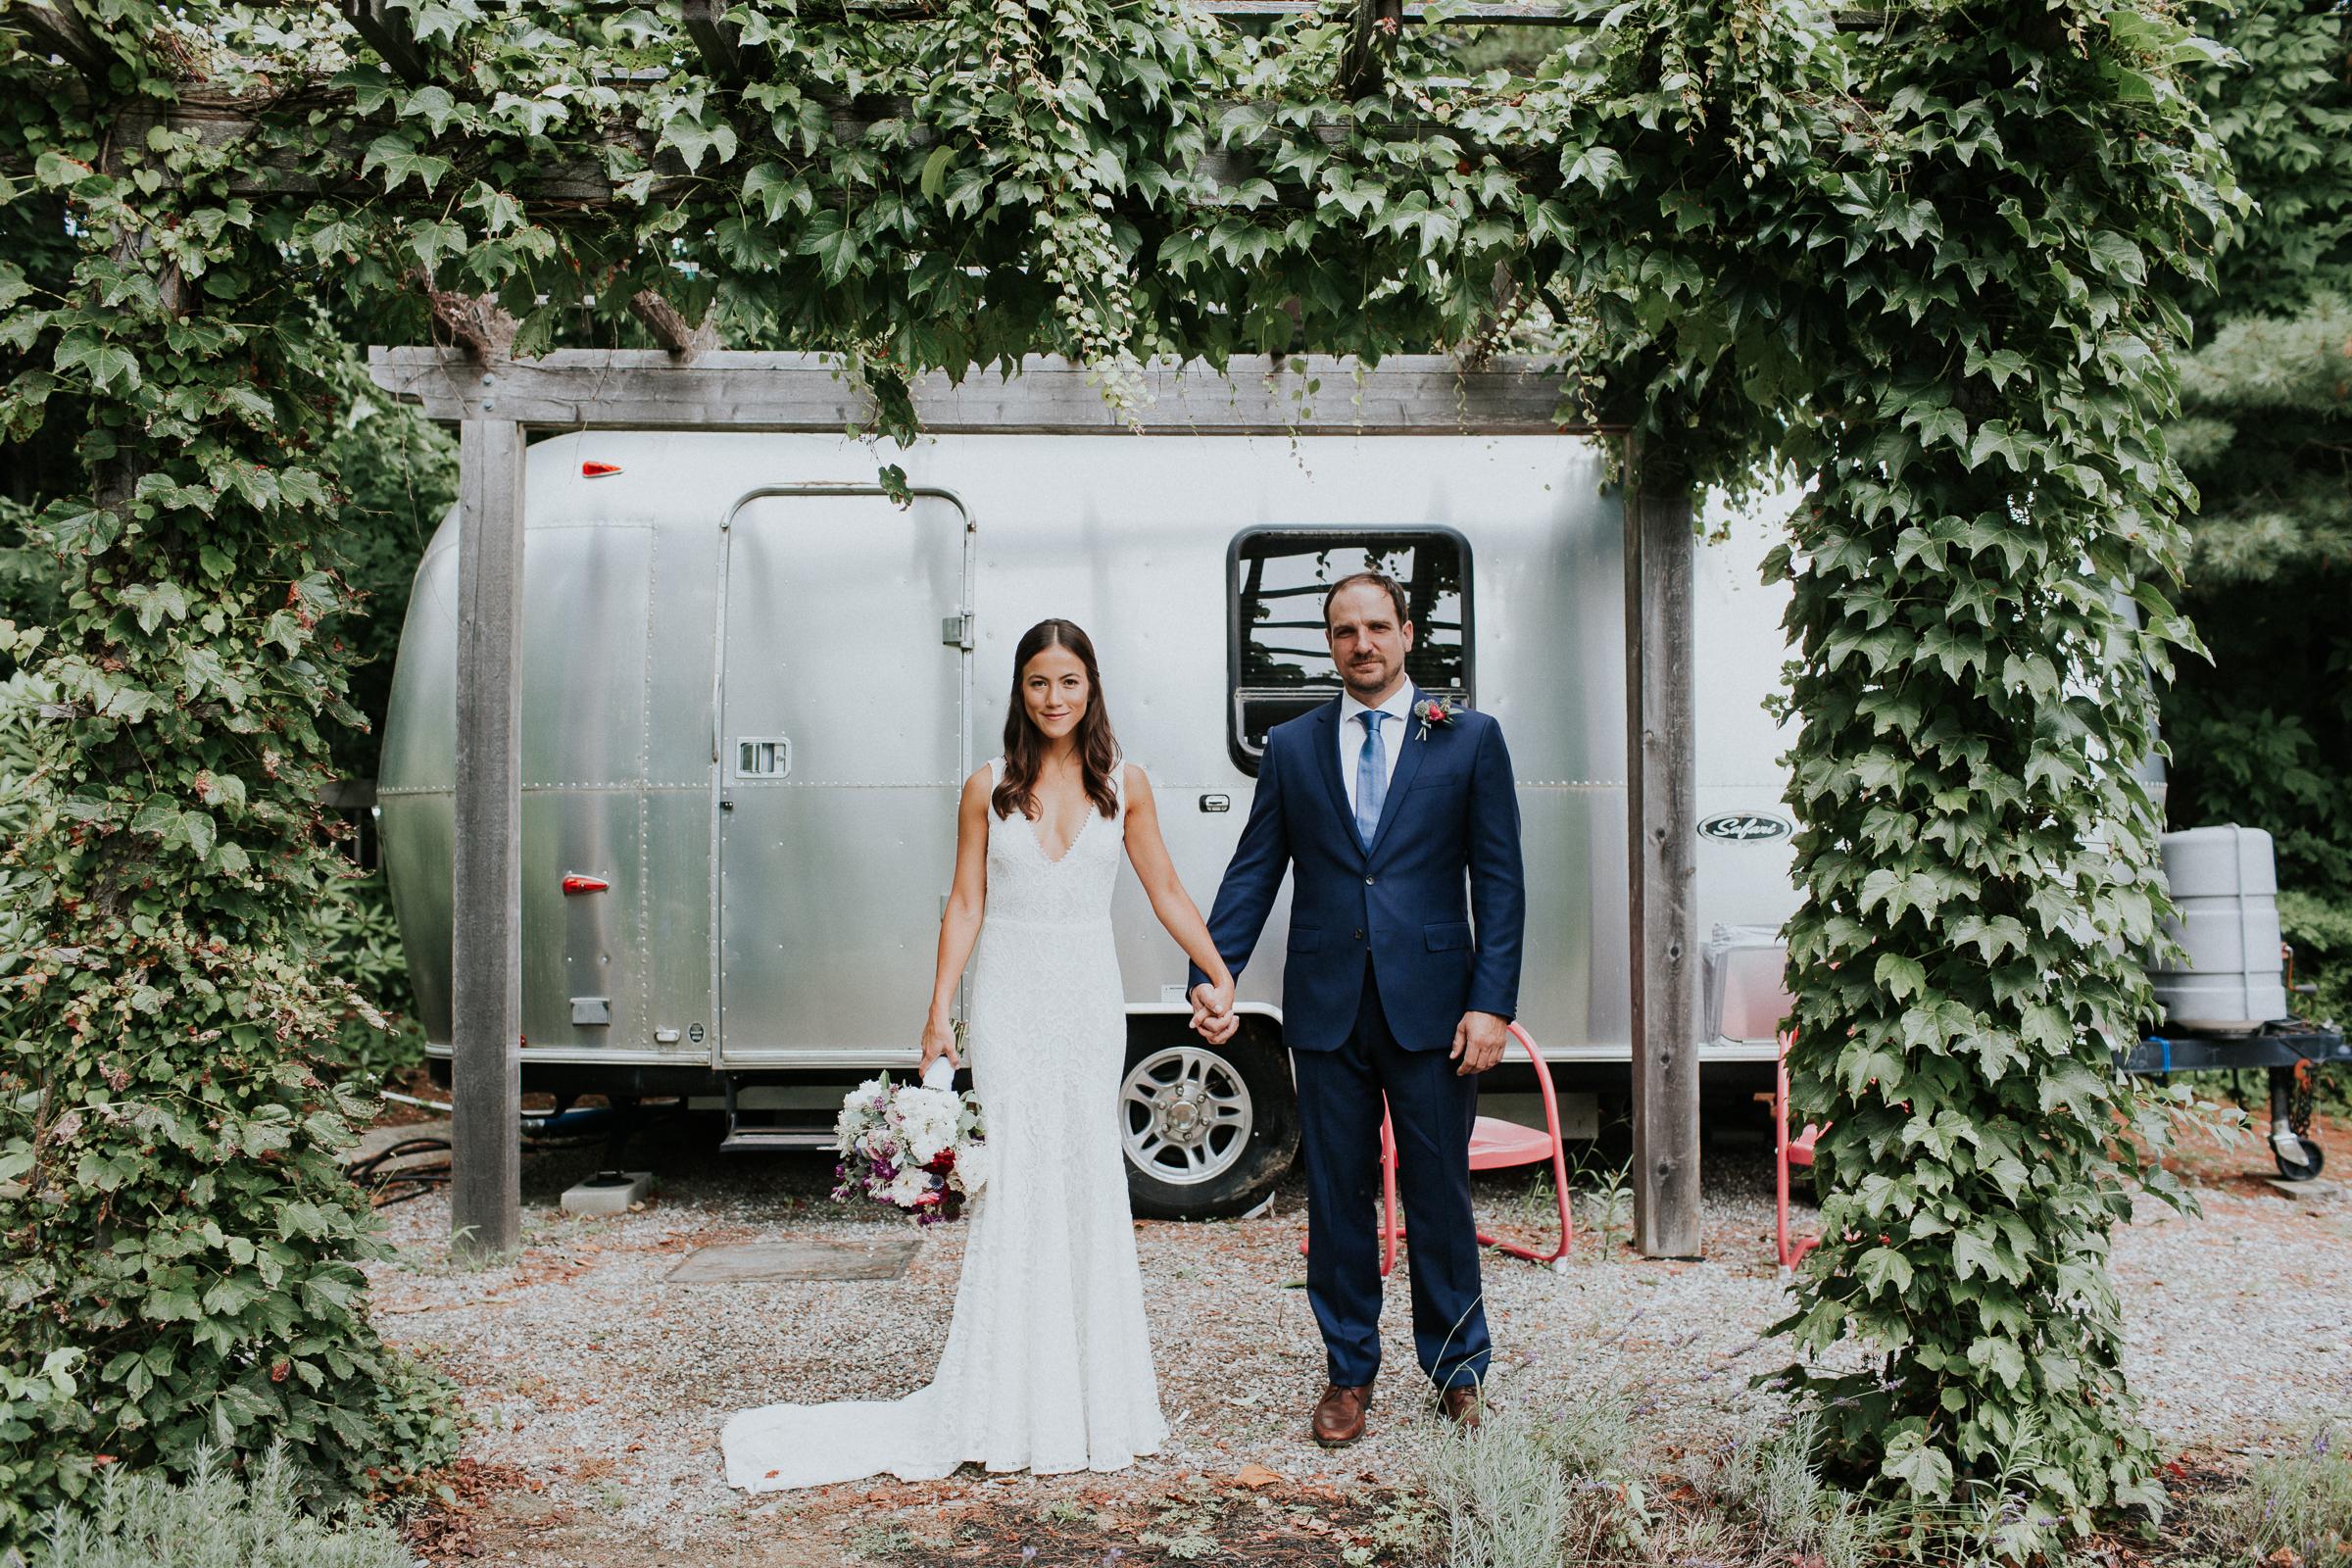 Marianmade-Farm-Wiscasset-Maine-Fine-Art-Documentary-Wedding-Photographer-Elvira-Kalviste-Photography-35.jpg